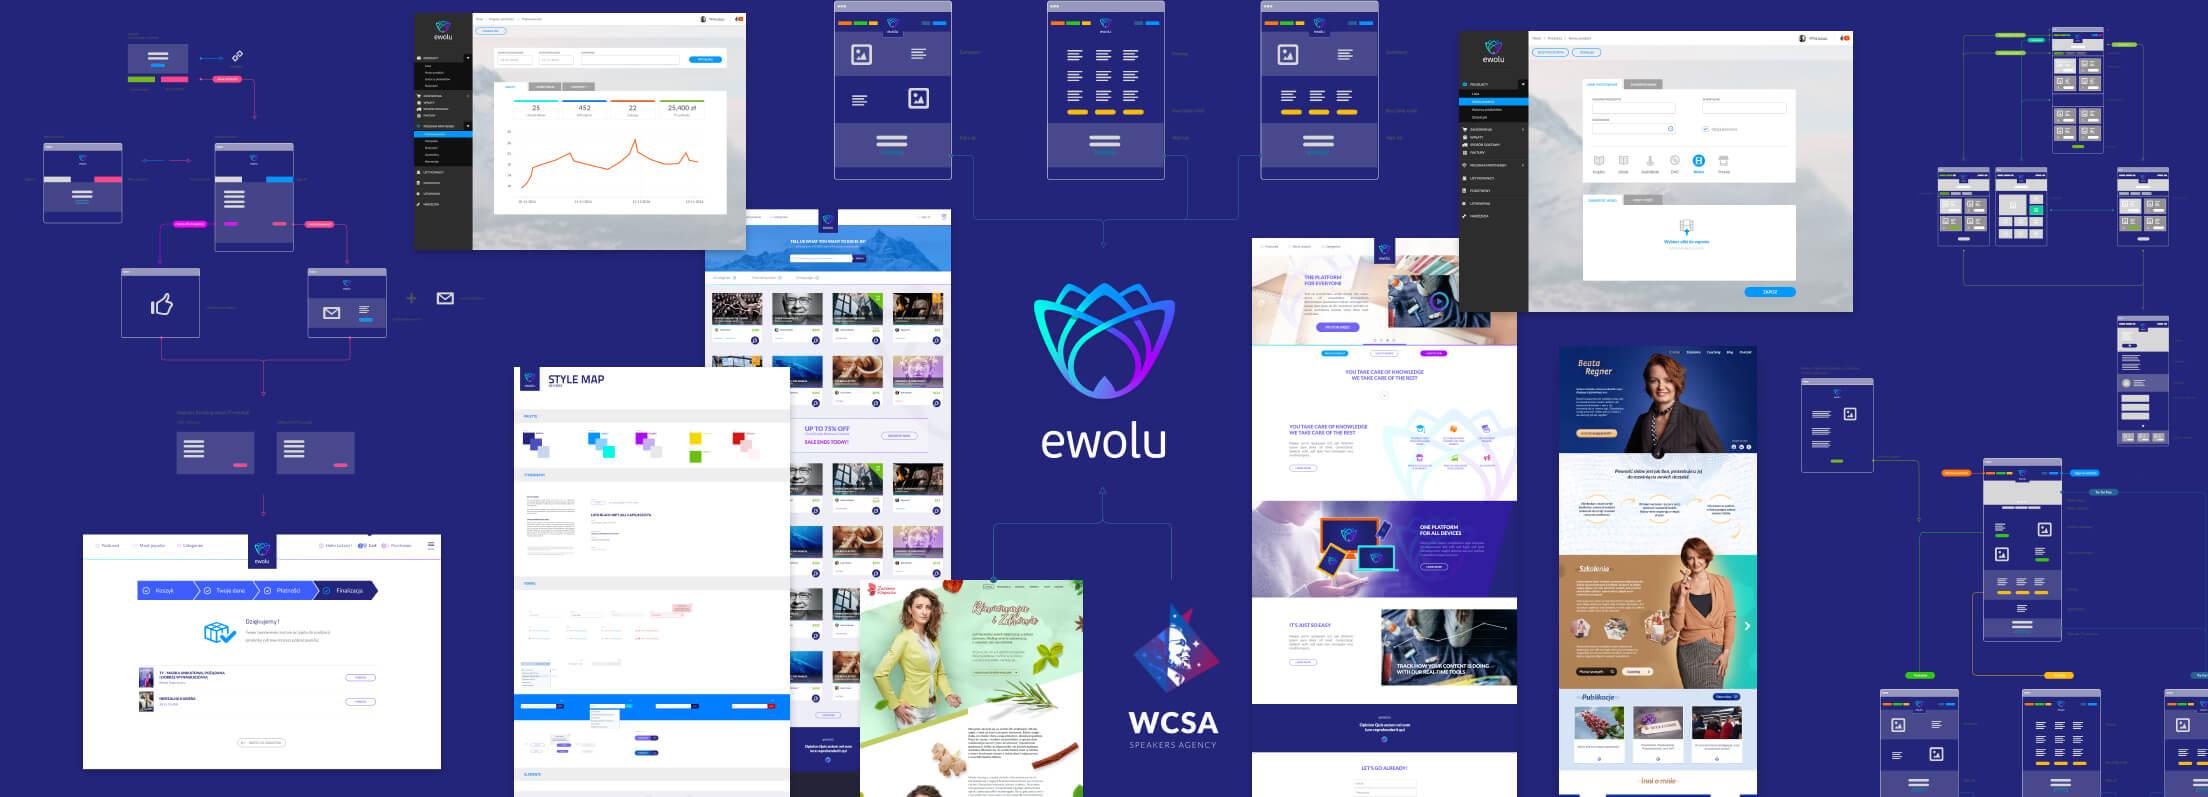 Ewolu e-learning platform